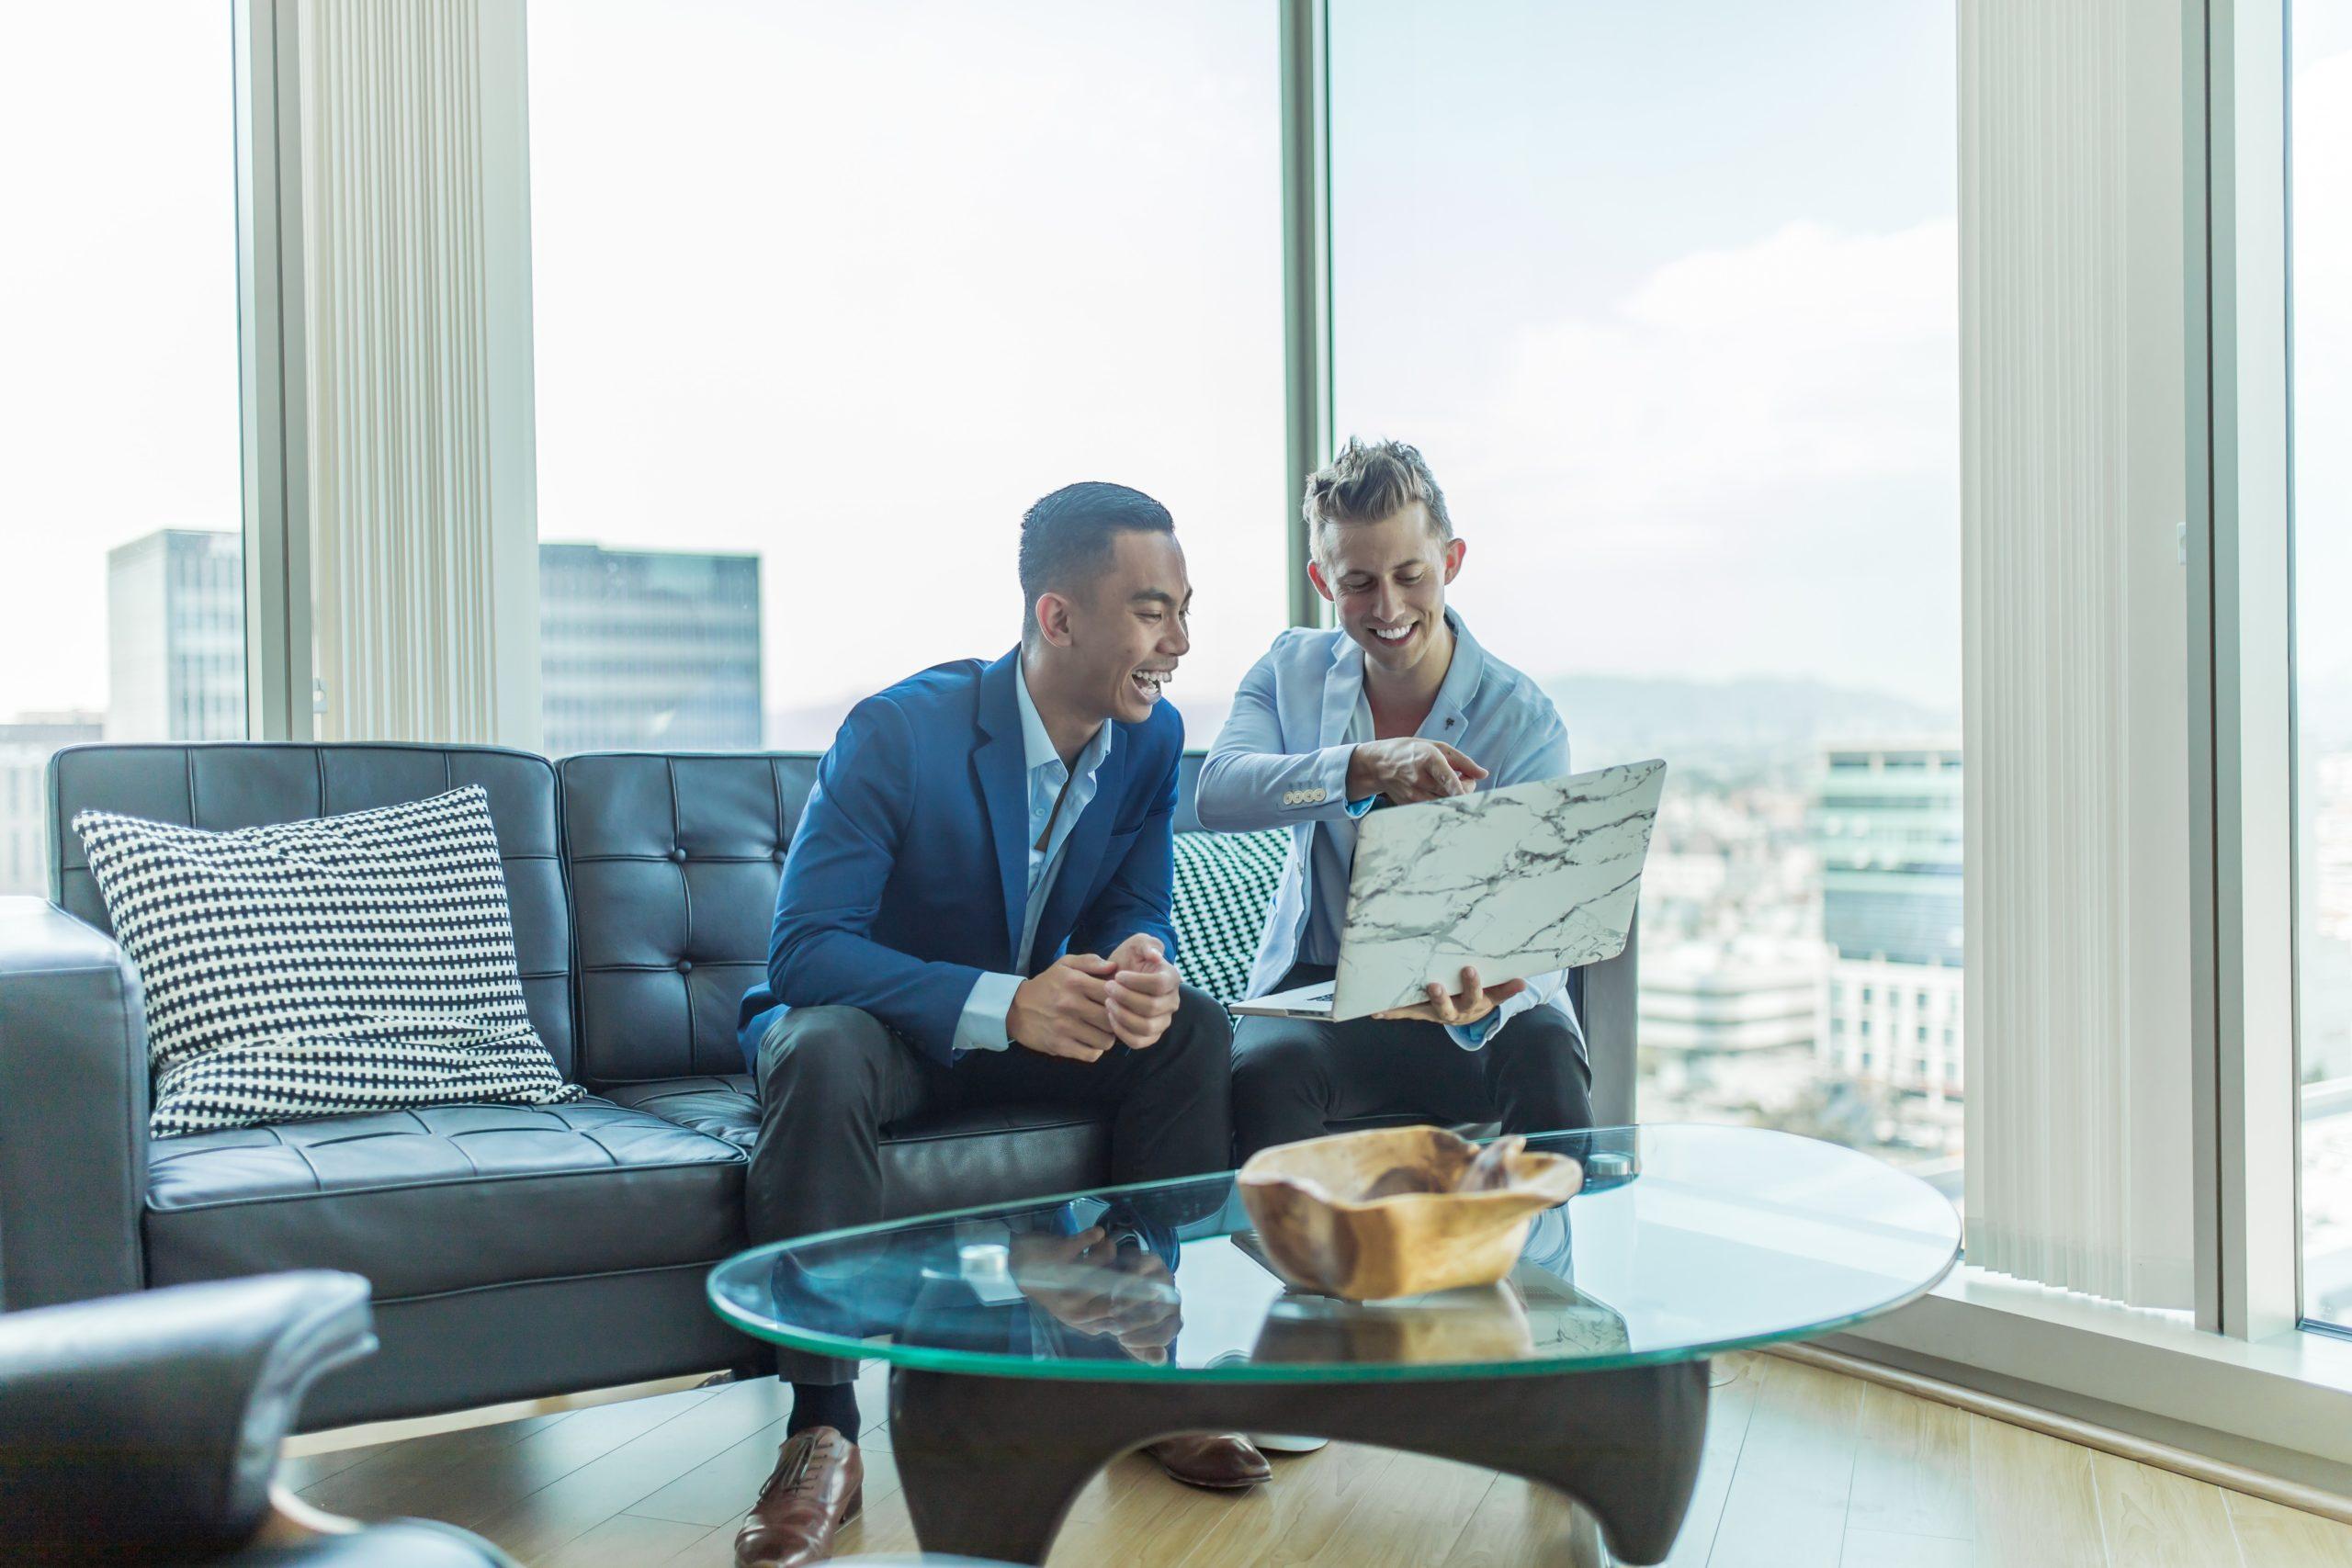 Digital mortgages